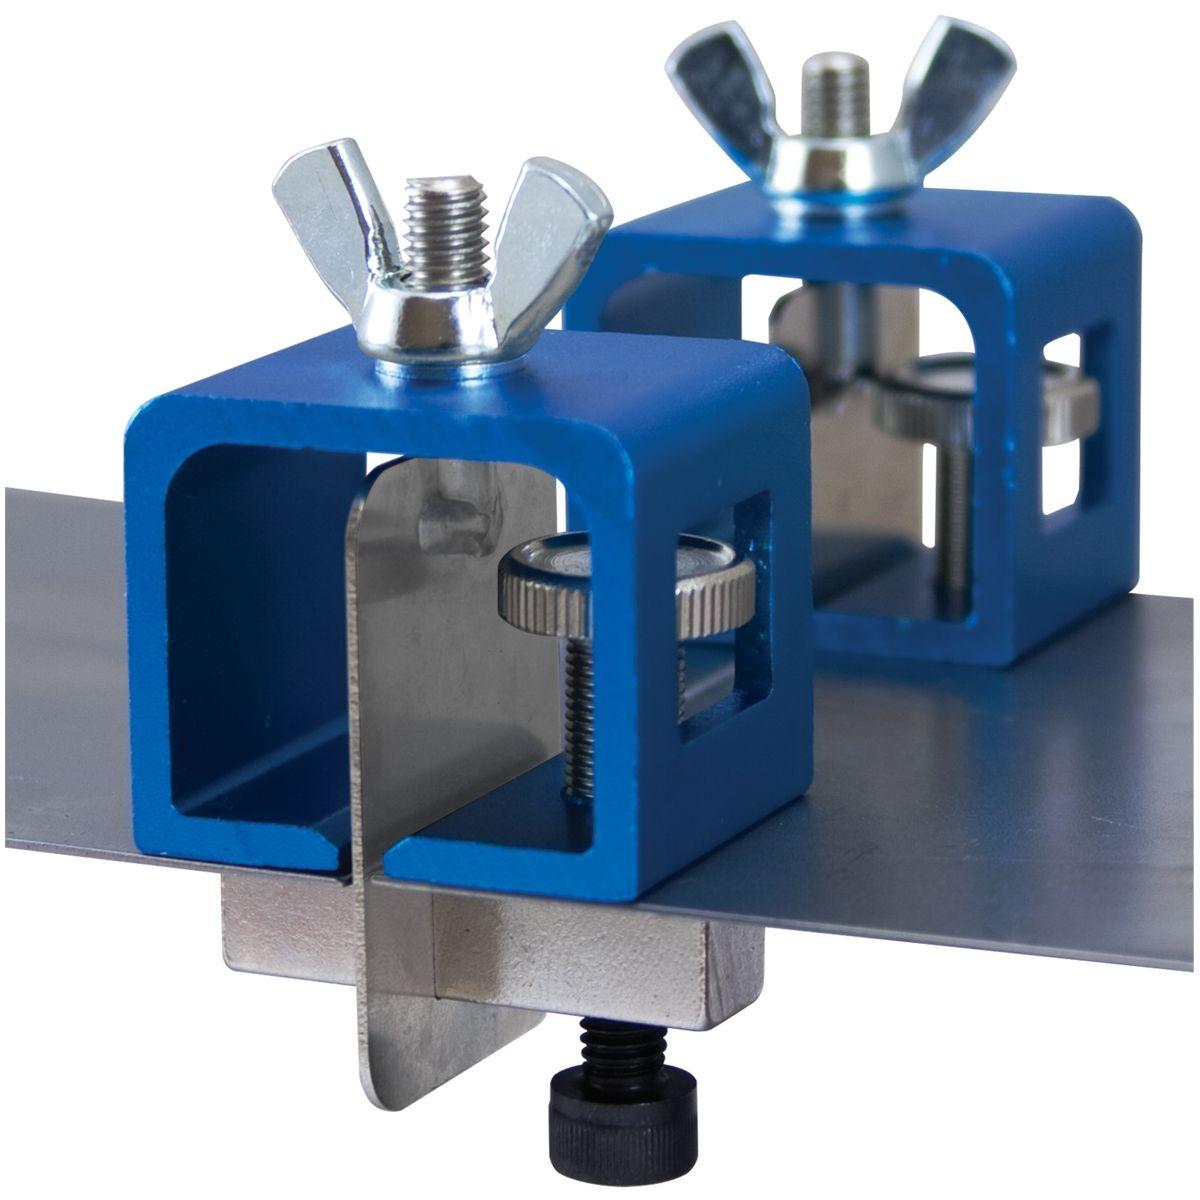 Braze Aluminium Panel : Butt weld clamps pc dent fix equipment df bc